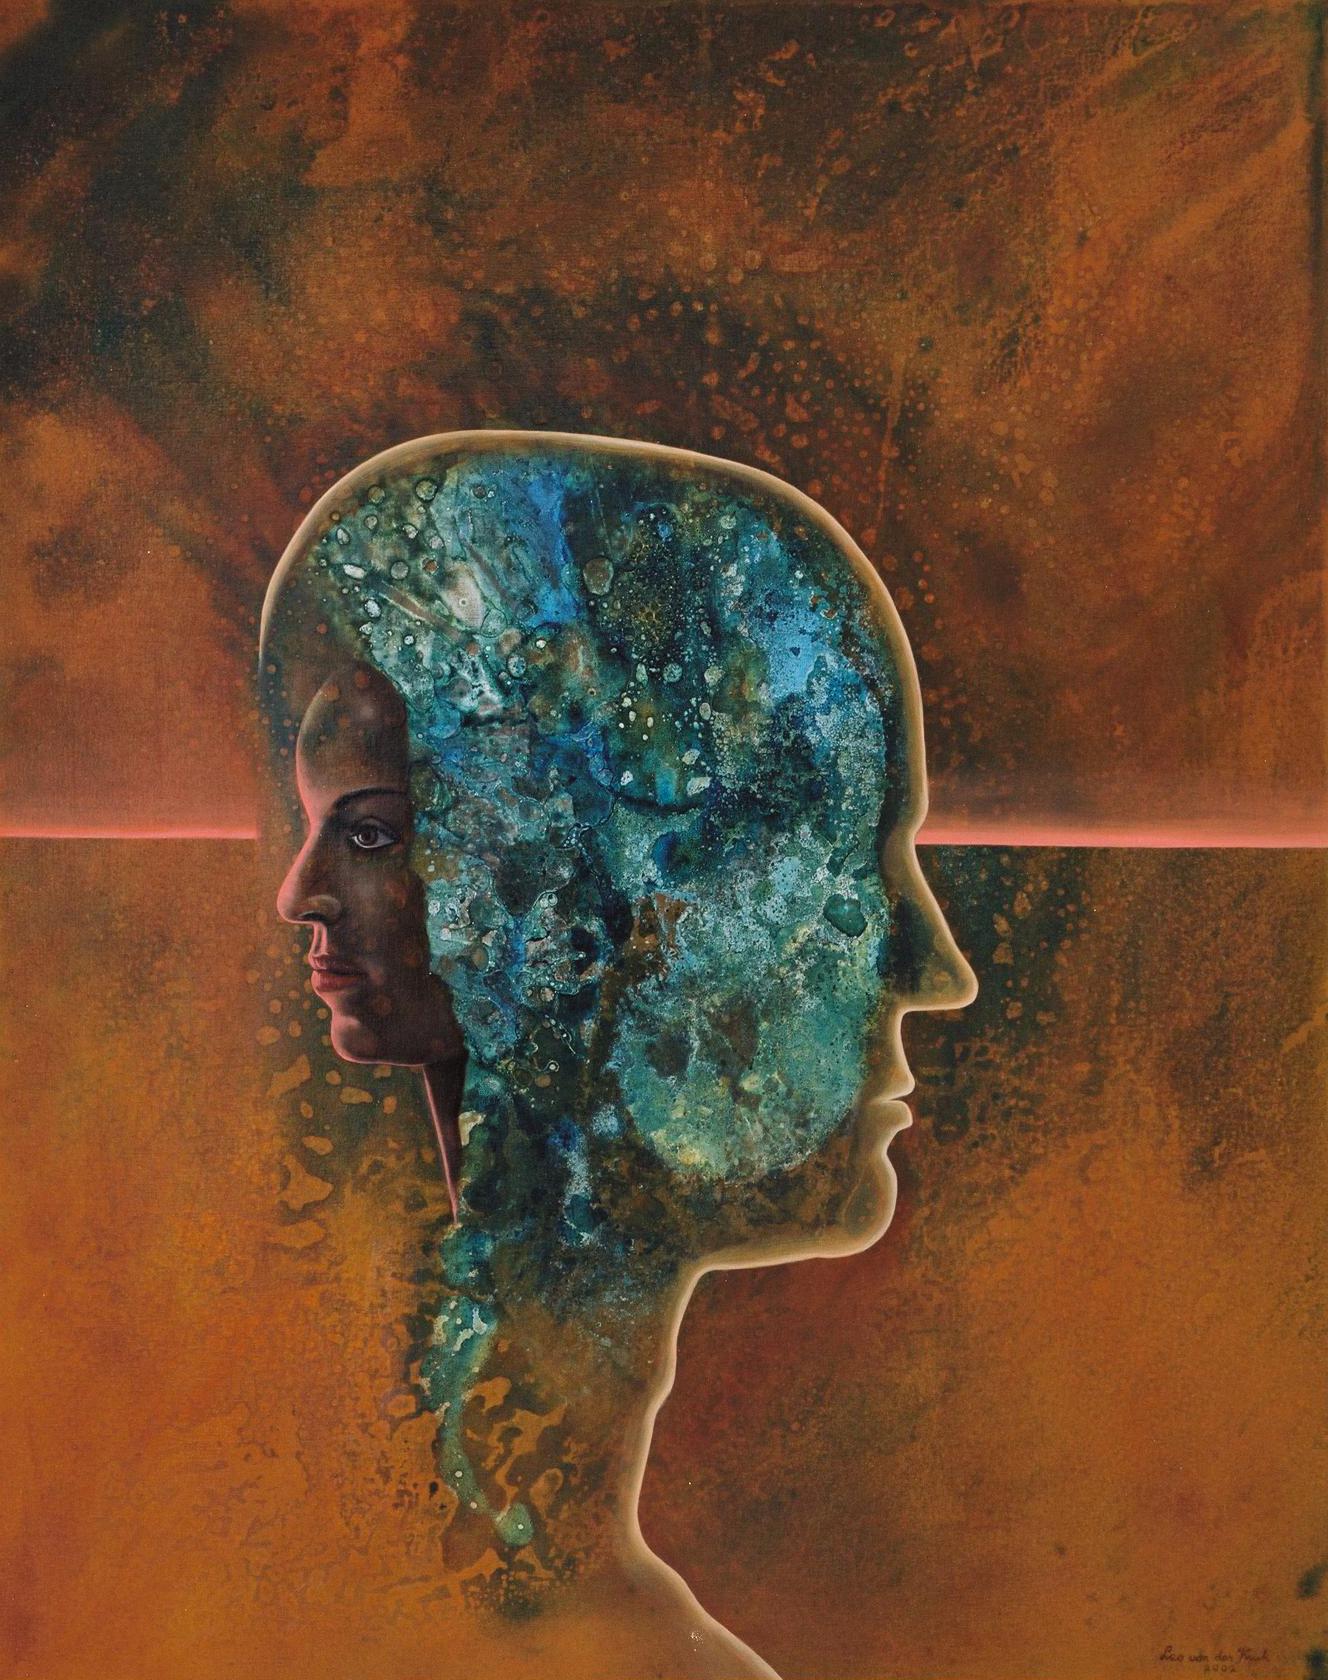 It's all in the mind (Leo van der Kruk, 2002, linnen 80x100 cm)